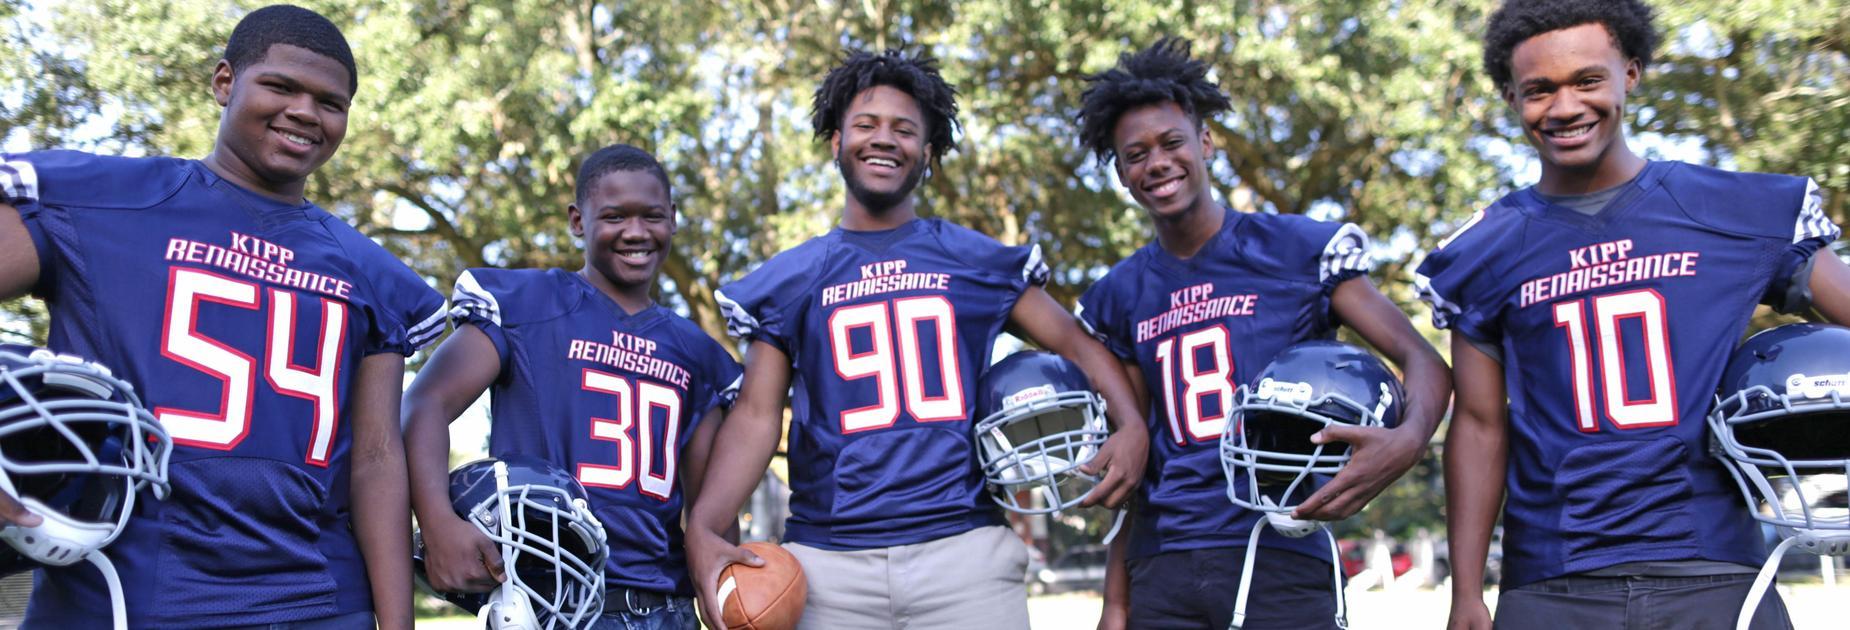 5 KRHS football team members posing in their jerseys and holding a helmet